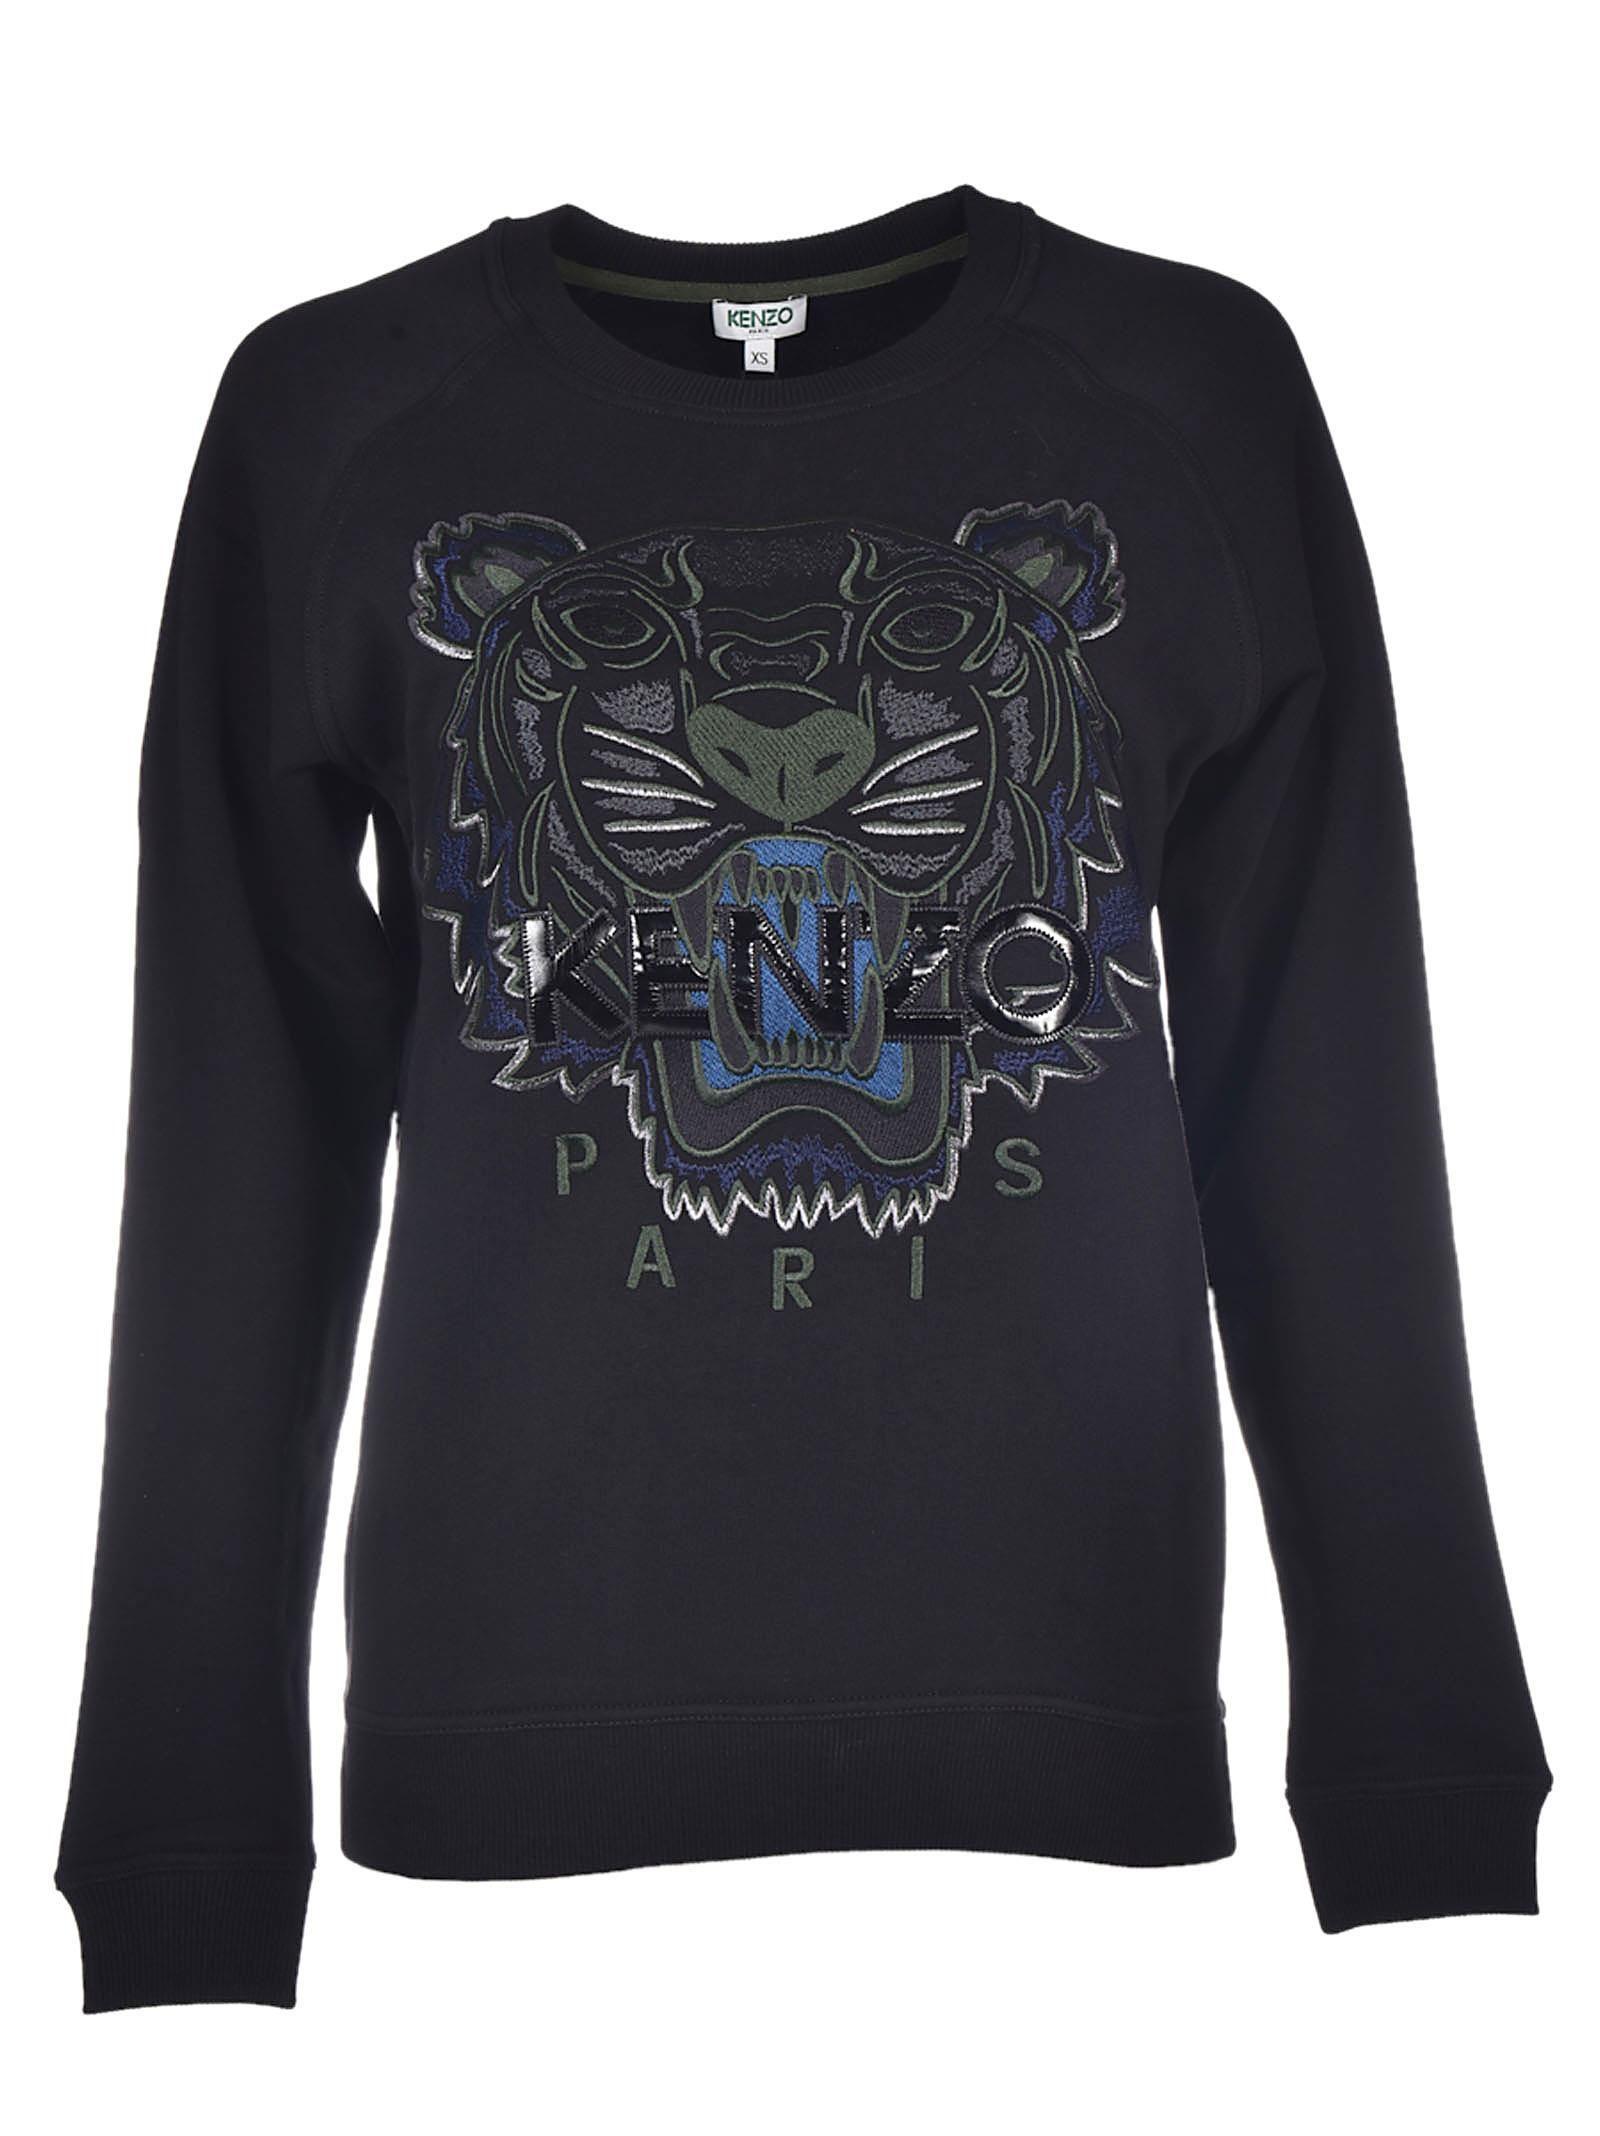 Tiger Classic Sweatshirt, Nero   Kenzo, Tigers and Sweatshirt ec5afb5a9e1